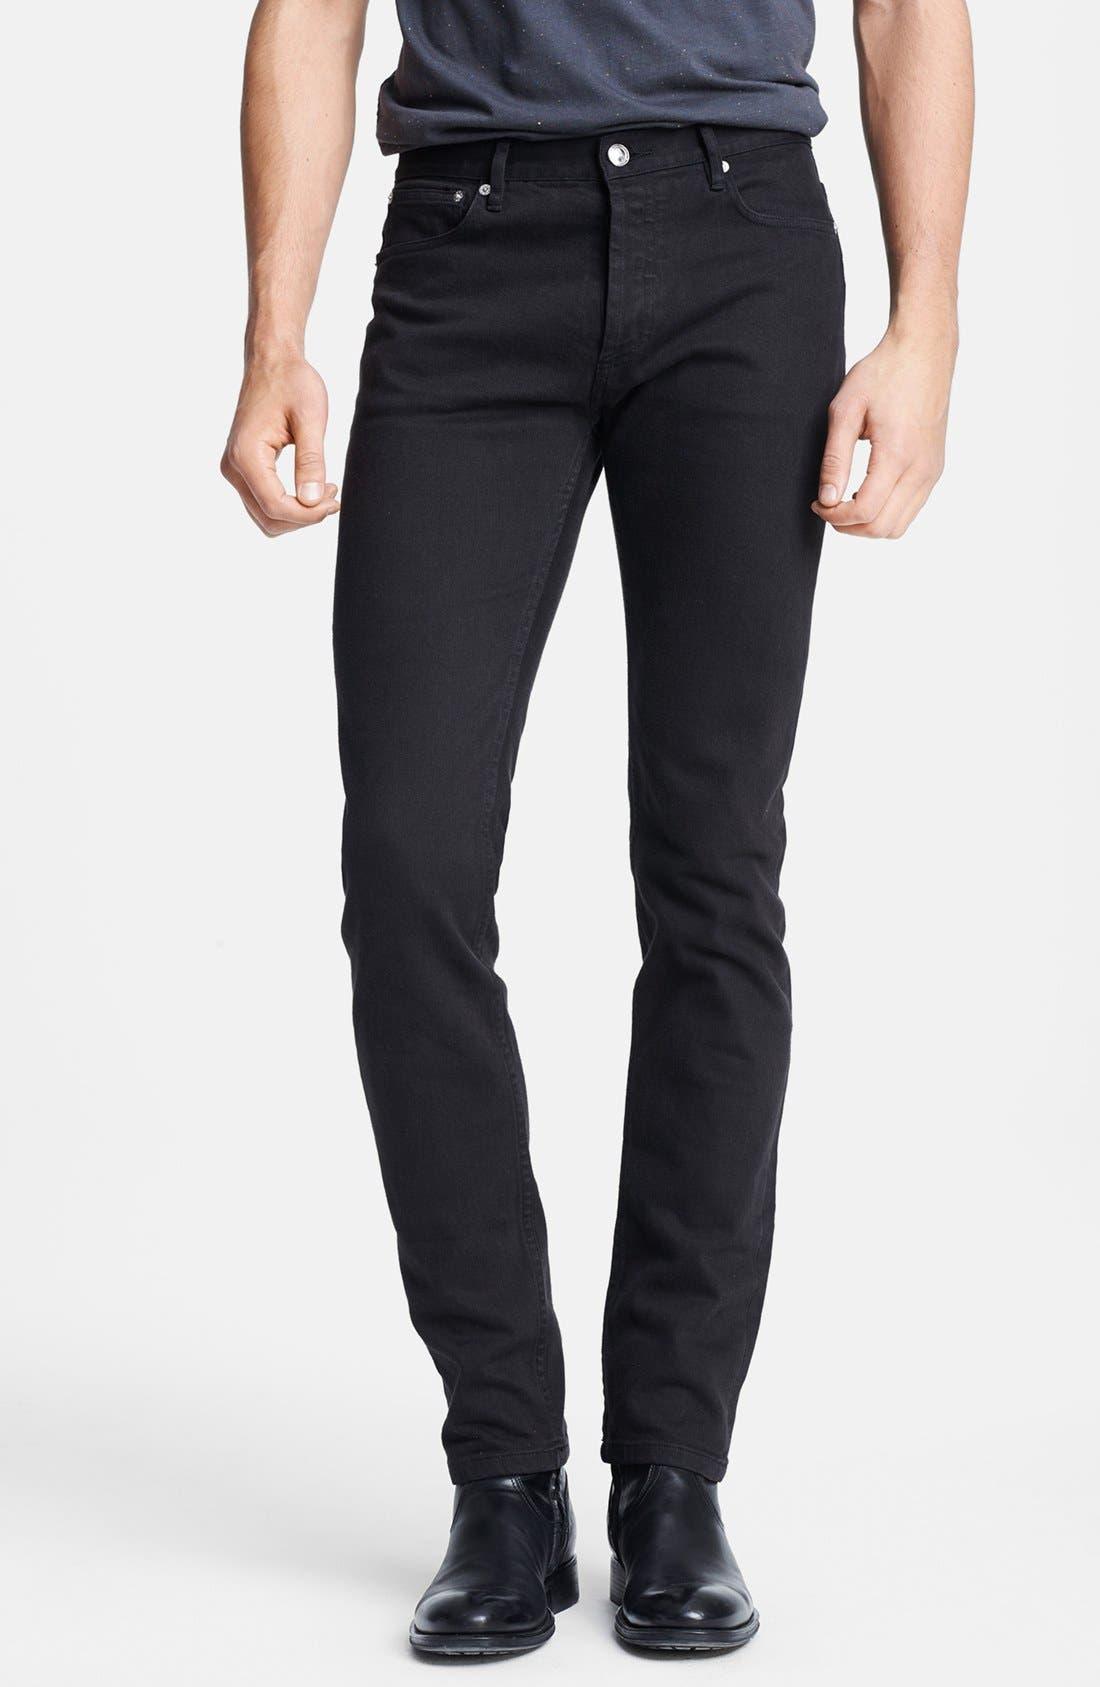 A.P.C. 'Petit Standard' Skinny Fit Jeans (Black)